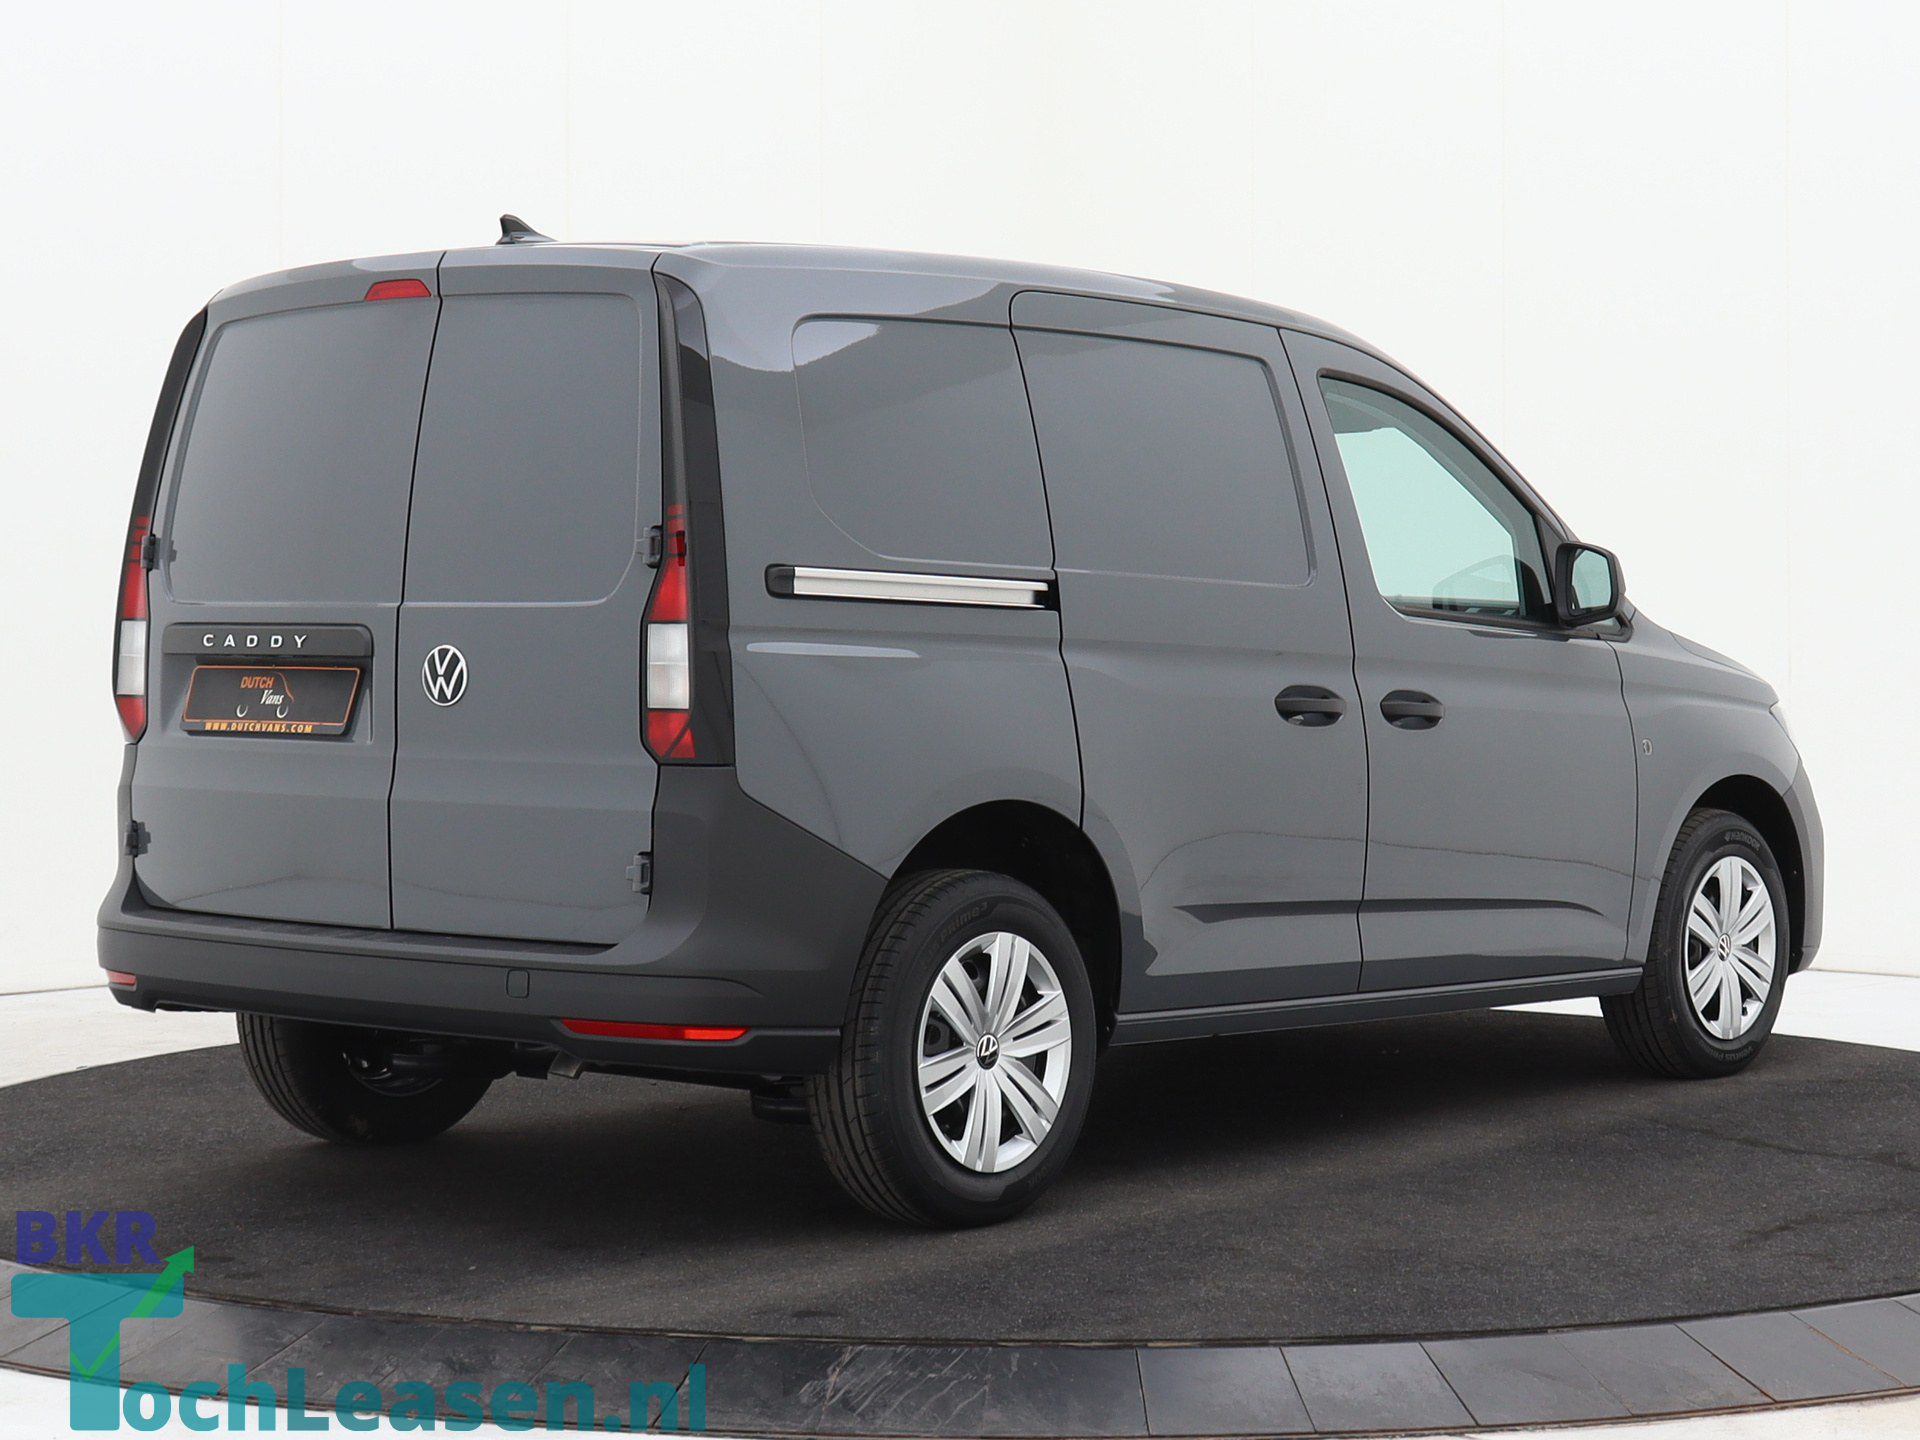 BKR toch leasen - Volkswagen Caddy - Grijs 15